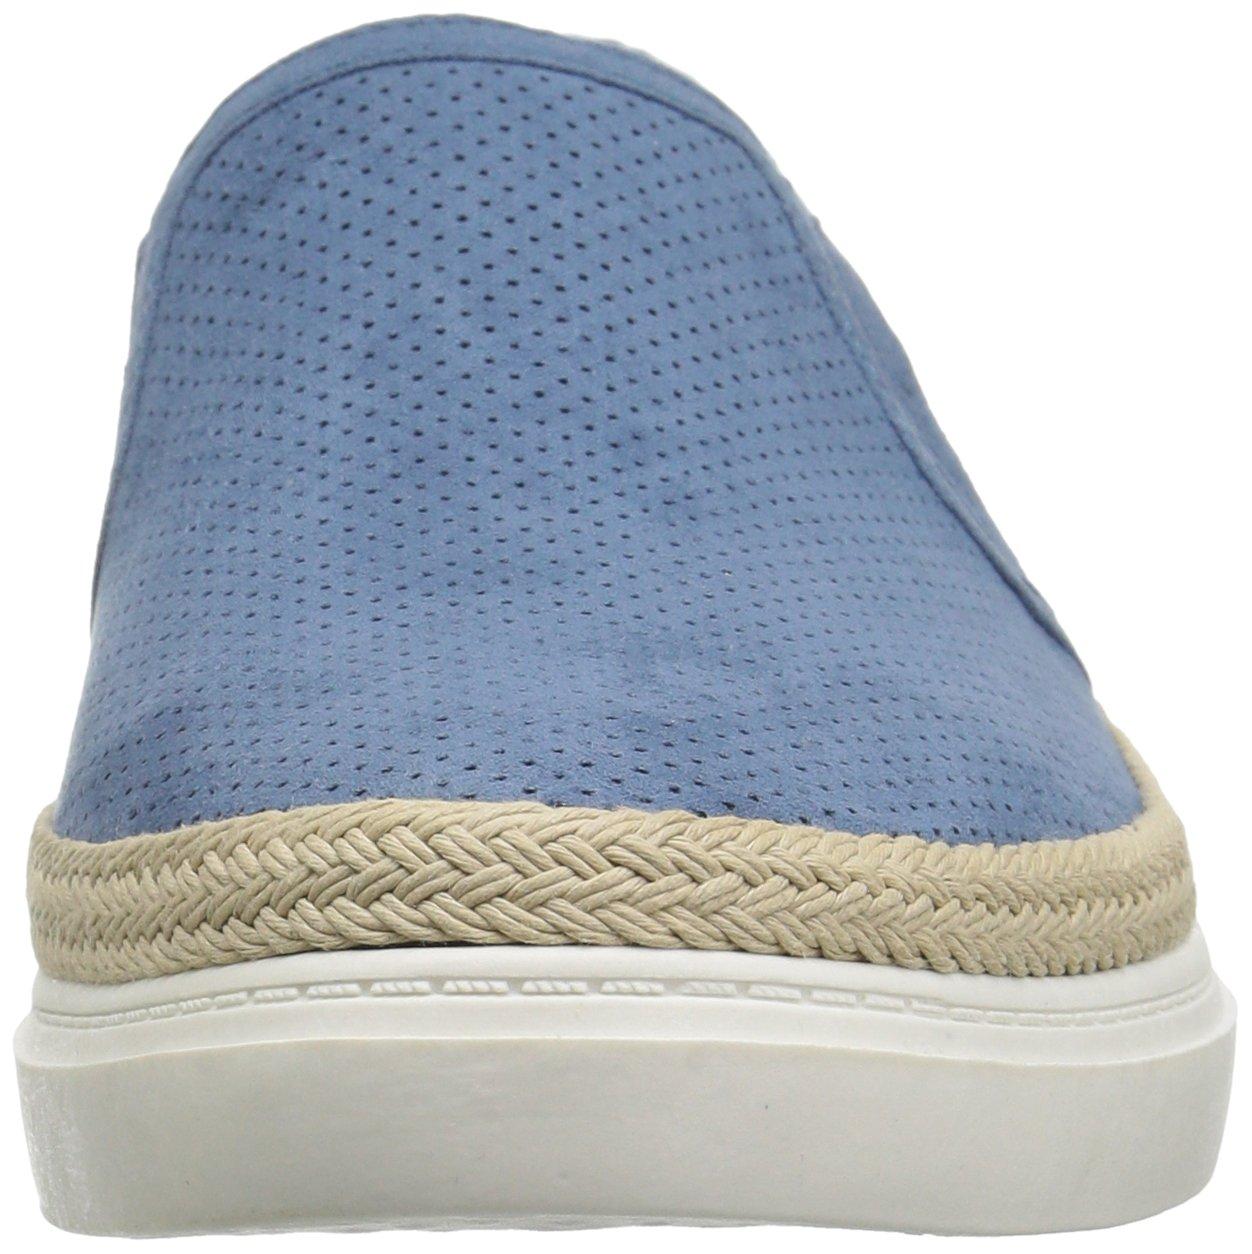 LifeStride Women's Loma 2 Sneaker B0775YFP6V 7 B(M) US Blue